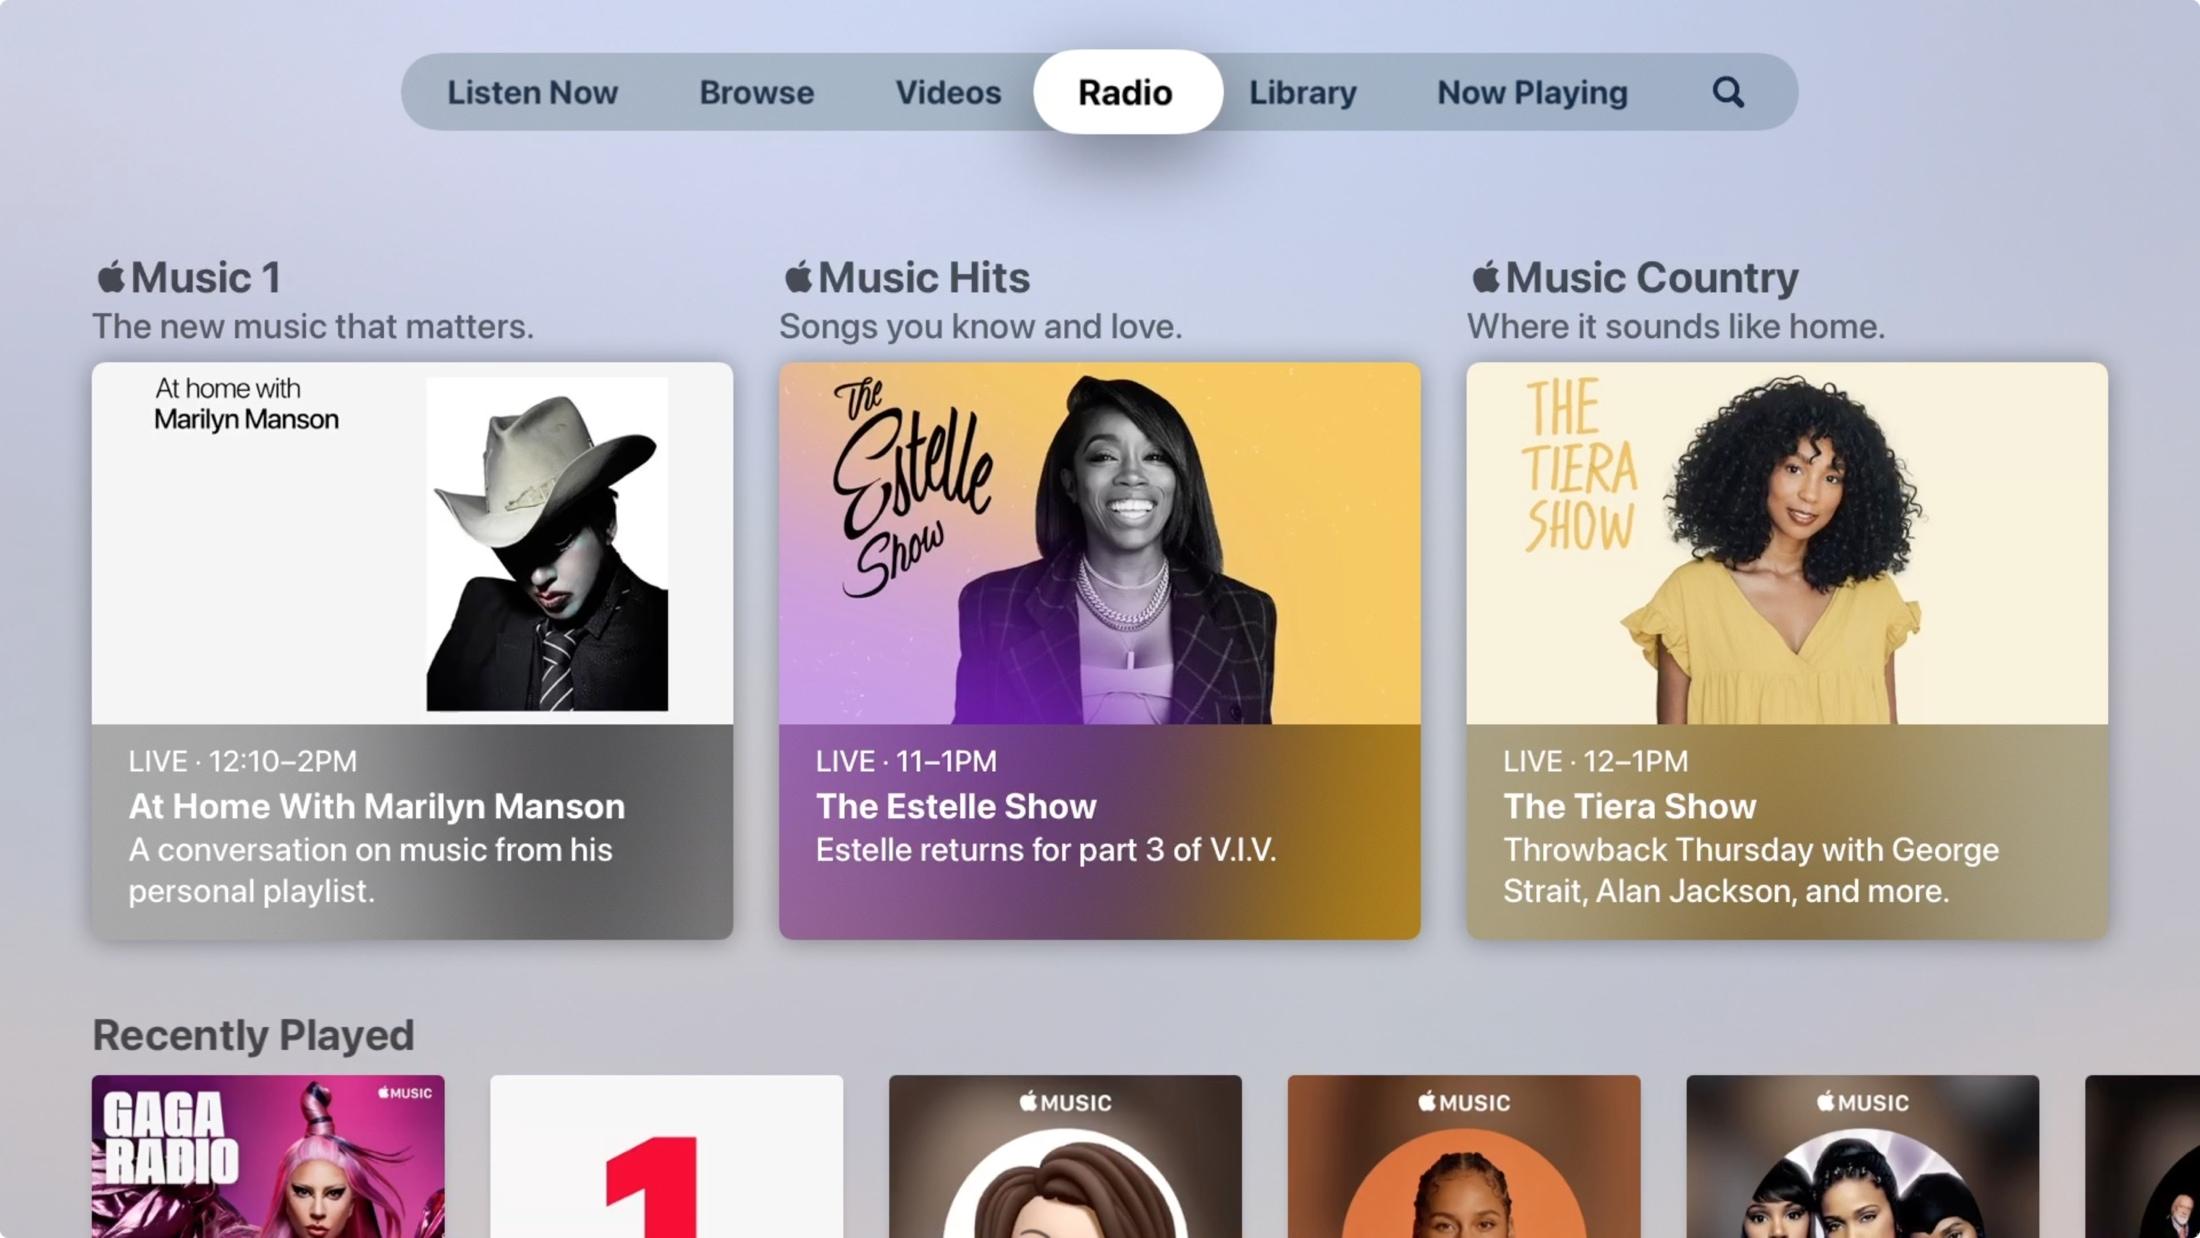 Radio in Music on Apple TV